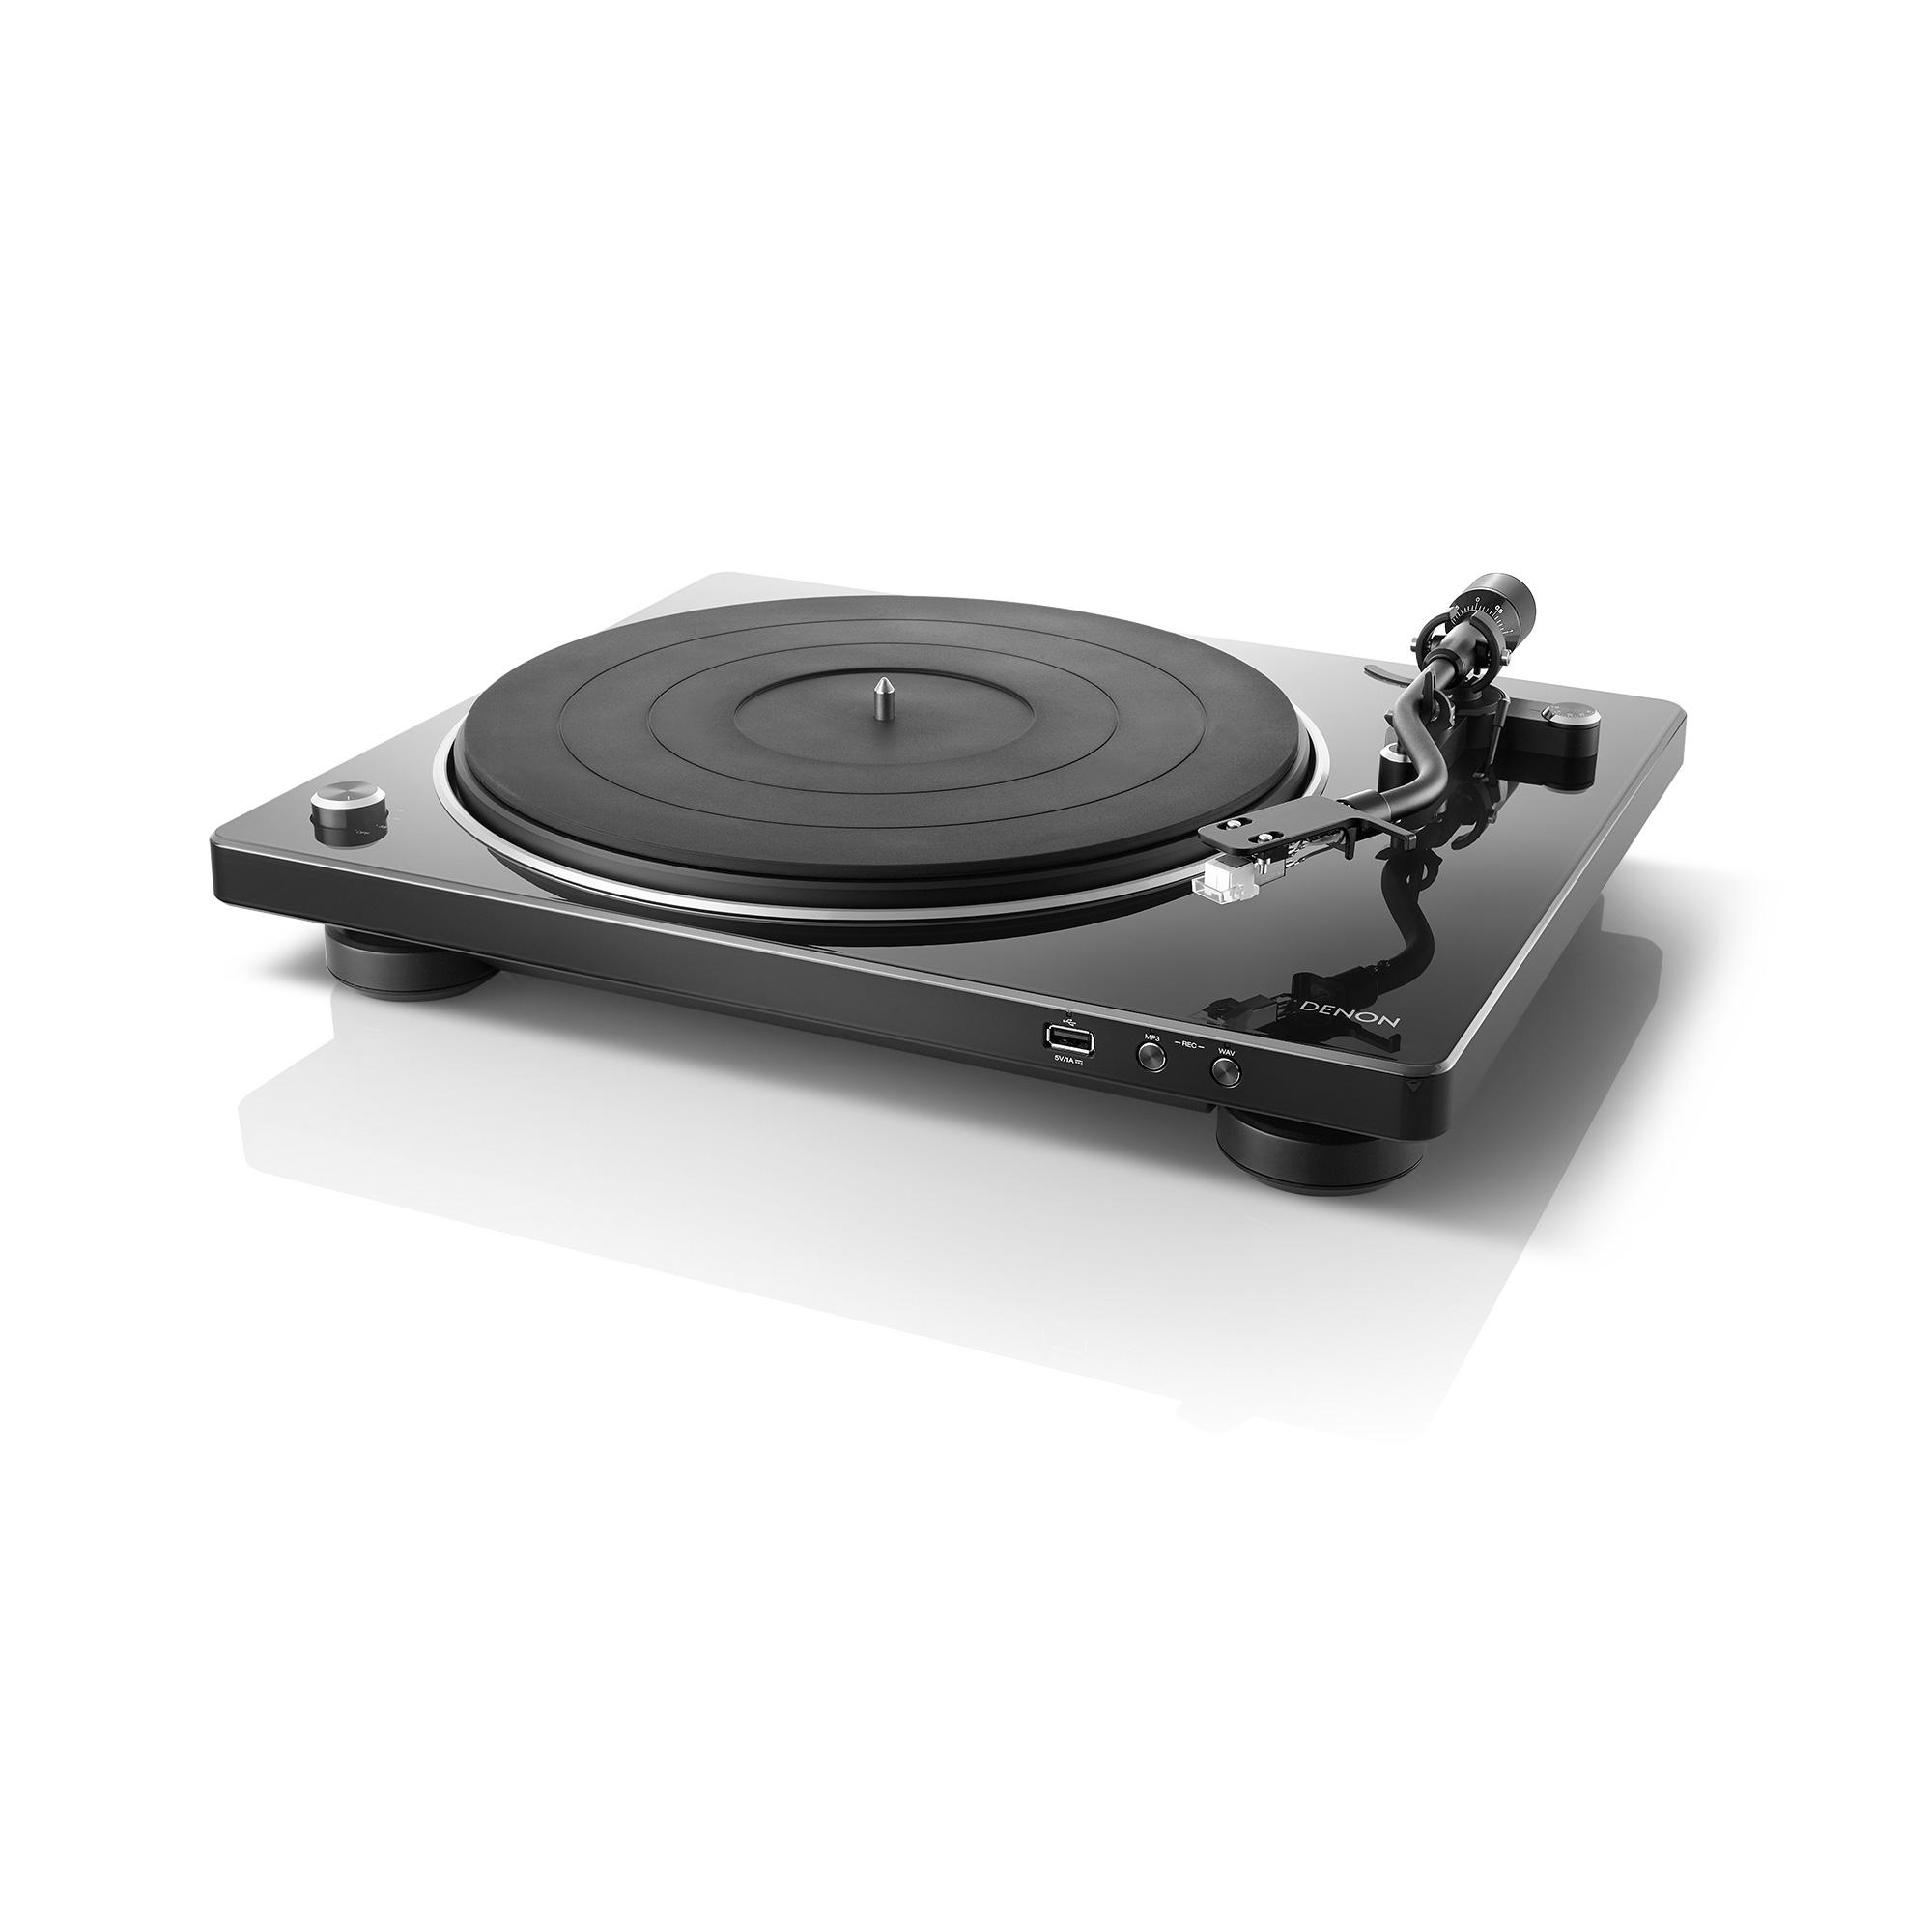 Denon DP-450 USB schwarz Plattenspieler 44136